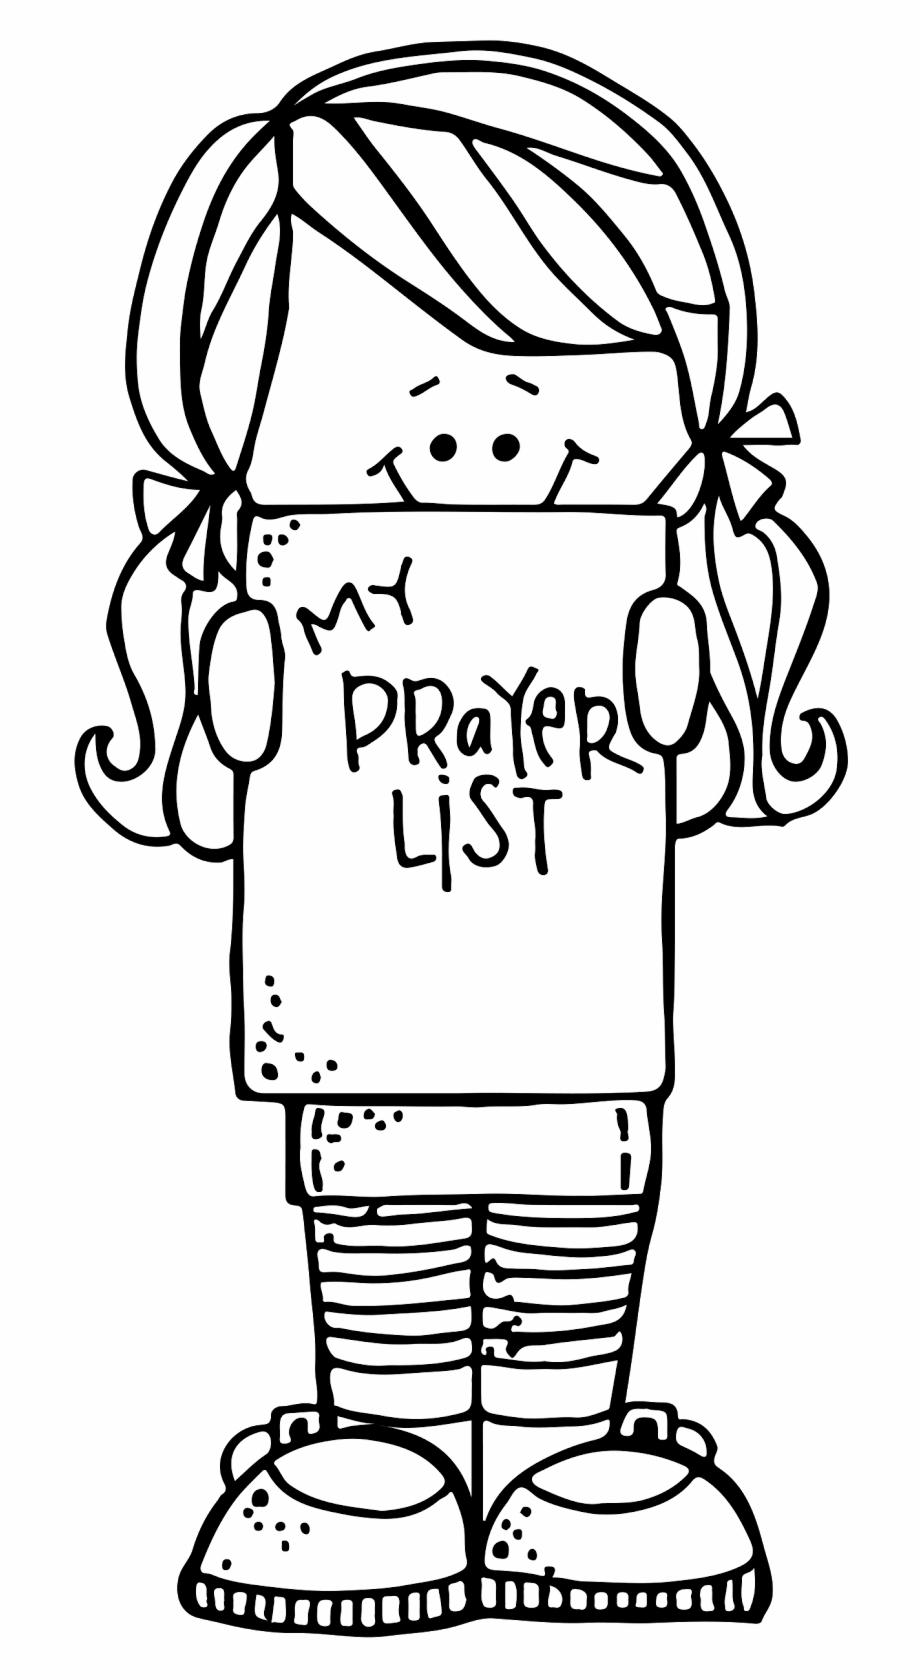 Library of prayer list transparent png files Clipart Art 2019